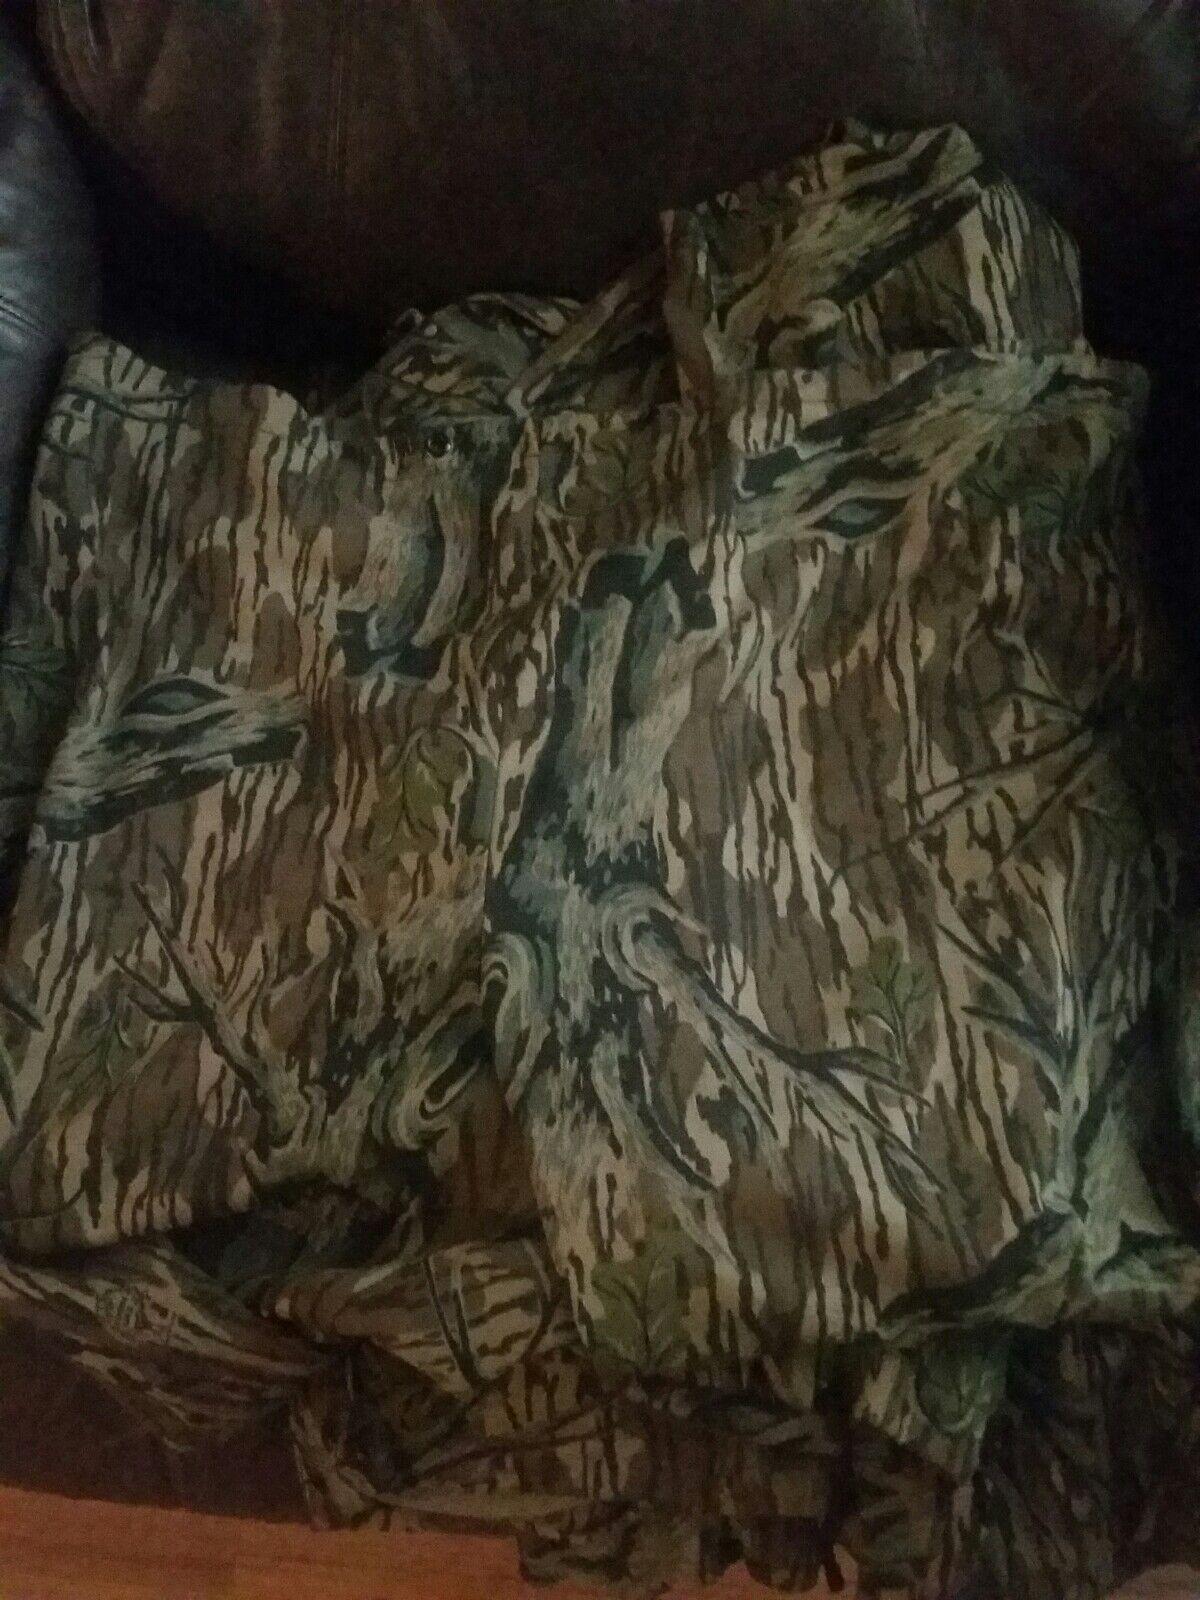 Vintage Mossy Oak Treestand Camo Hunting Pants Small Medium. Slip over. USA made